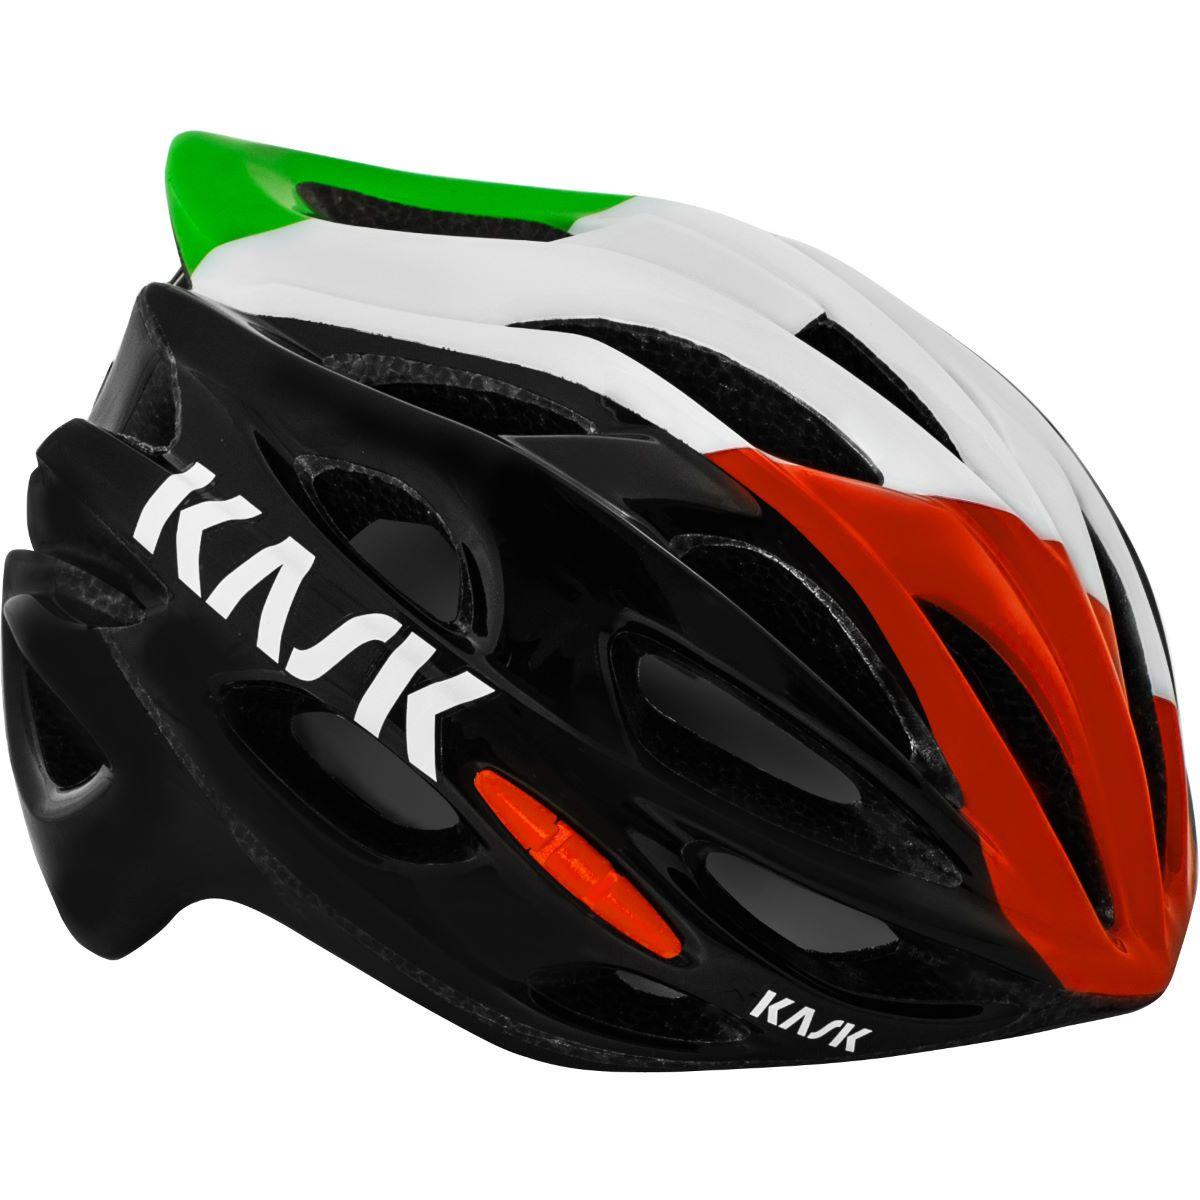 Kask Mojito Road Helmet Italian Flag Edition Road Helmets